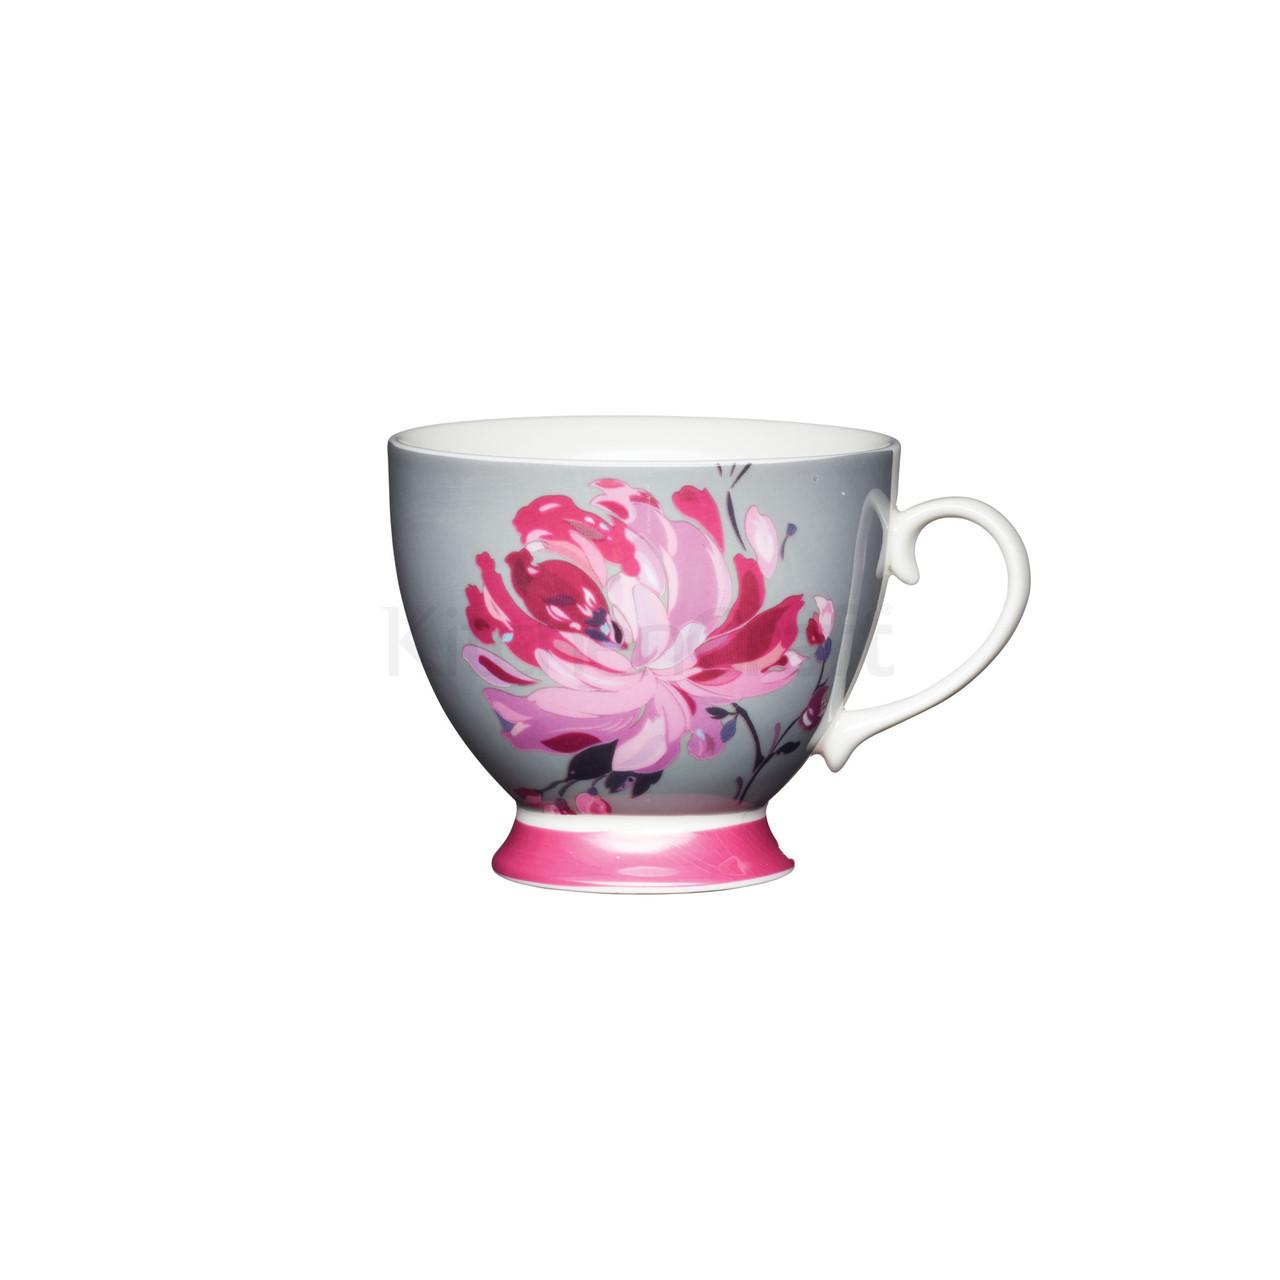 KC Чашка фарфоровая Розовый цветок 400 мл